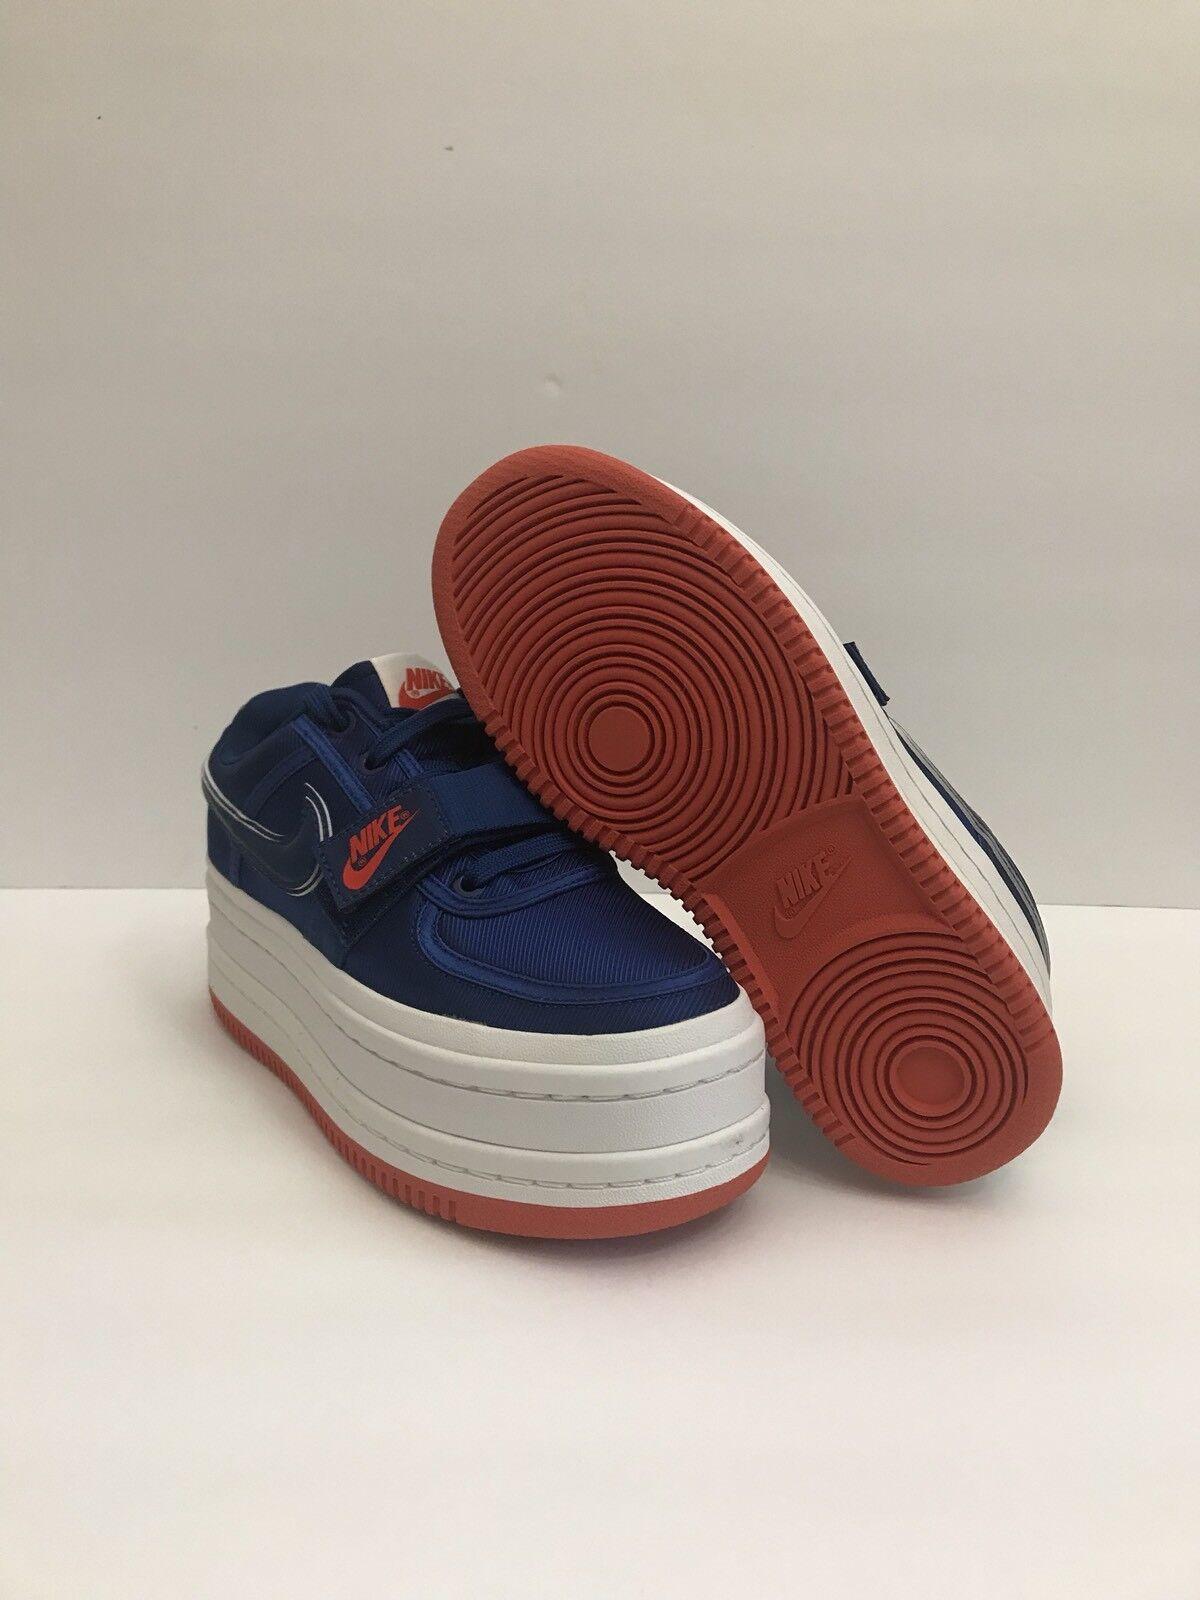 Nike Women's Vandal 2K Double StackGym Blue- Summit White AO2868-400 Size 6